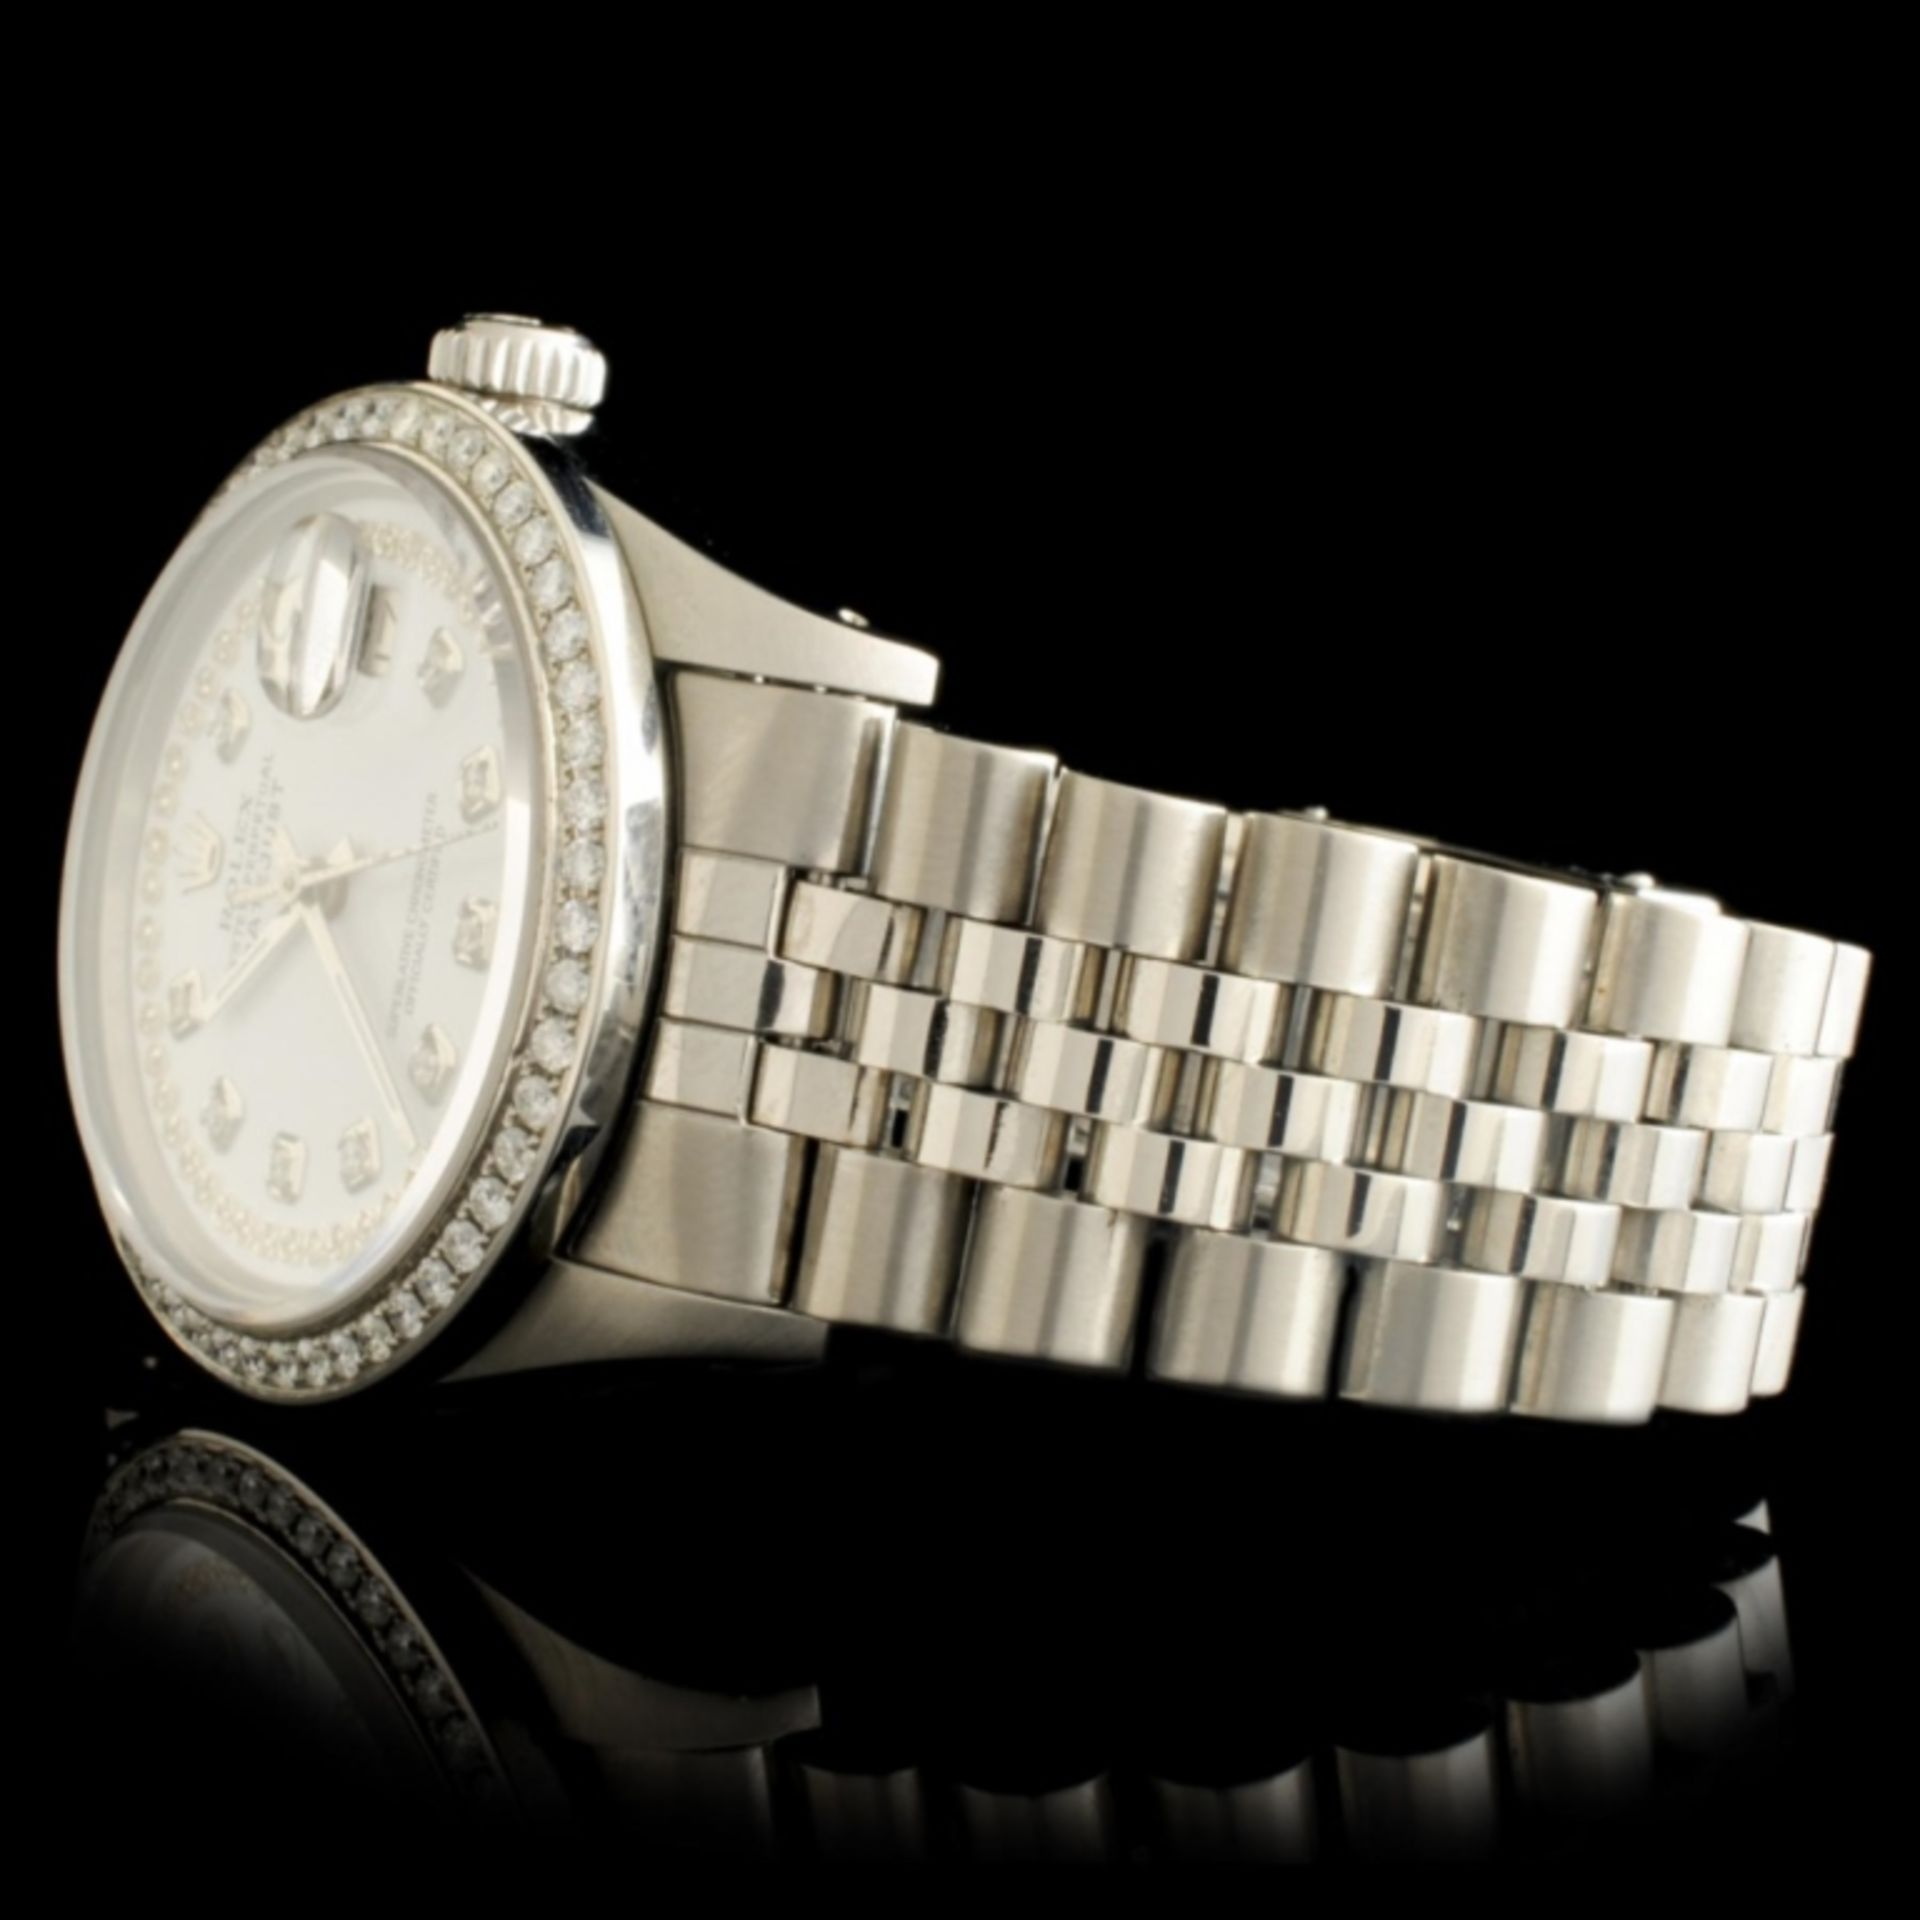 Rolex DateJust Diamond 36MM Wristwatch - Image 4 of 7